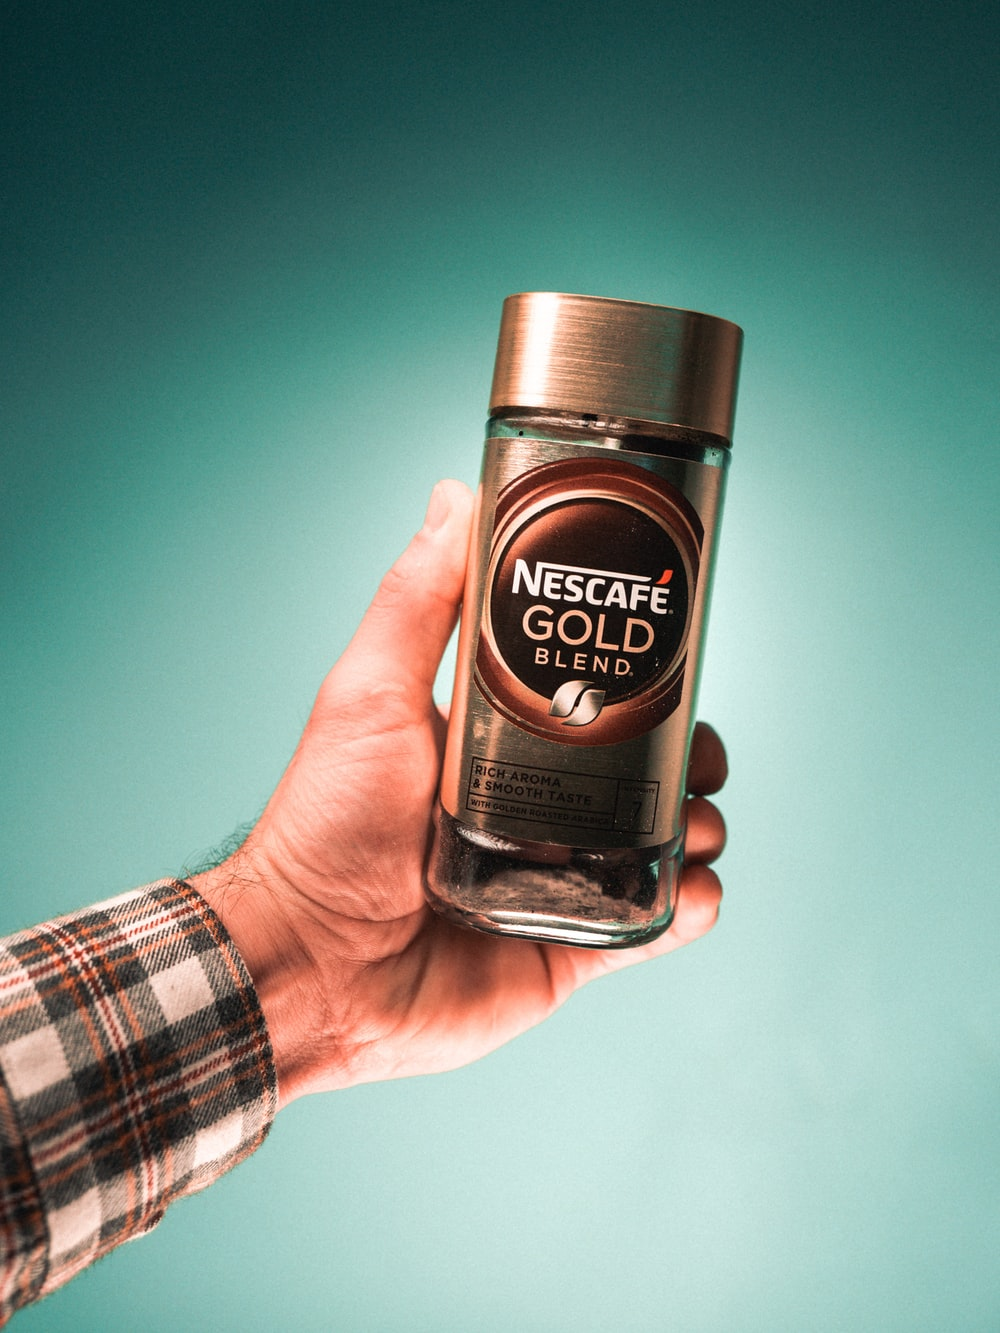 person holding nescafe gold blend bottle